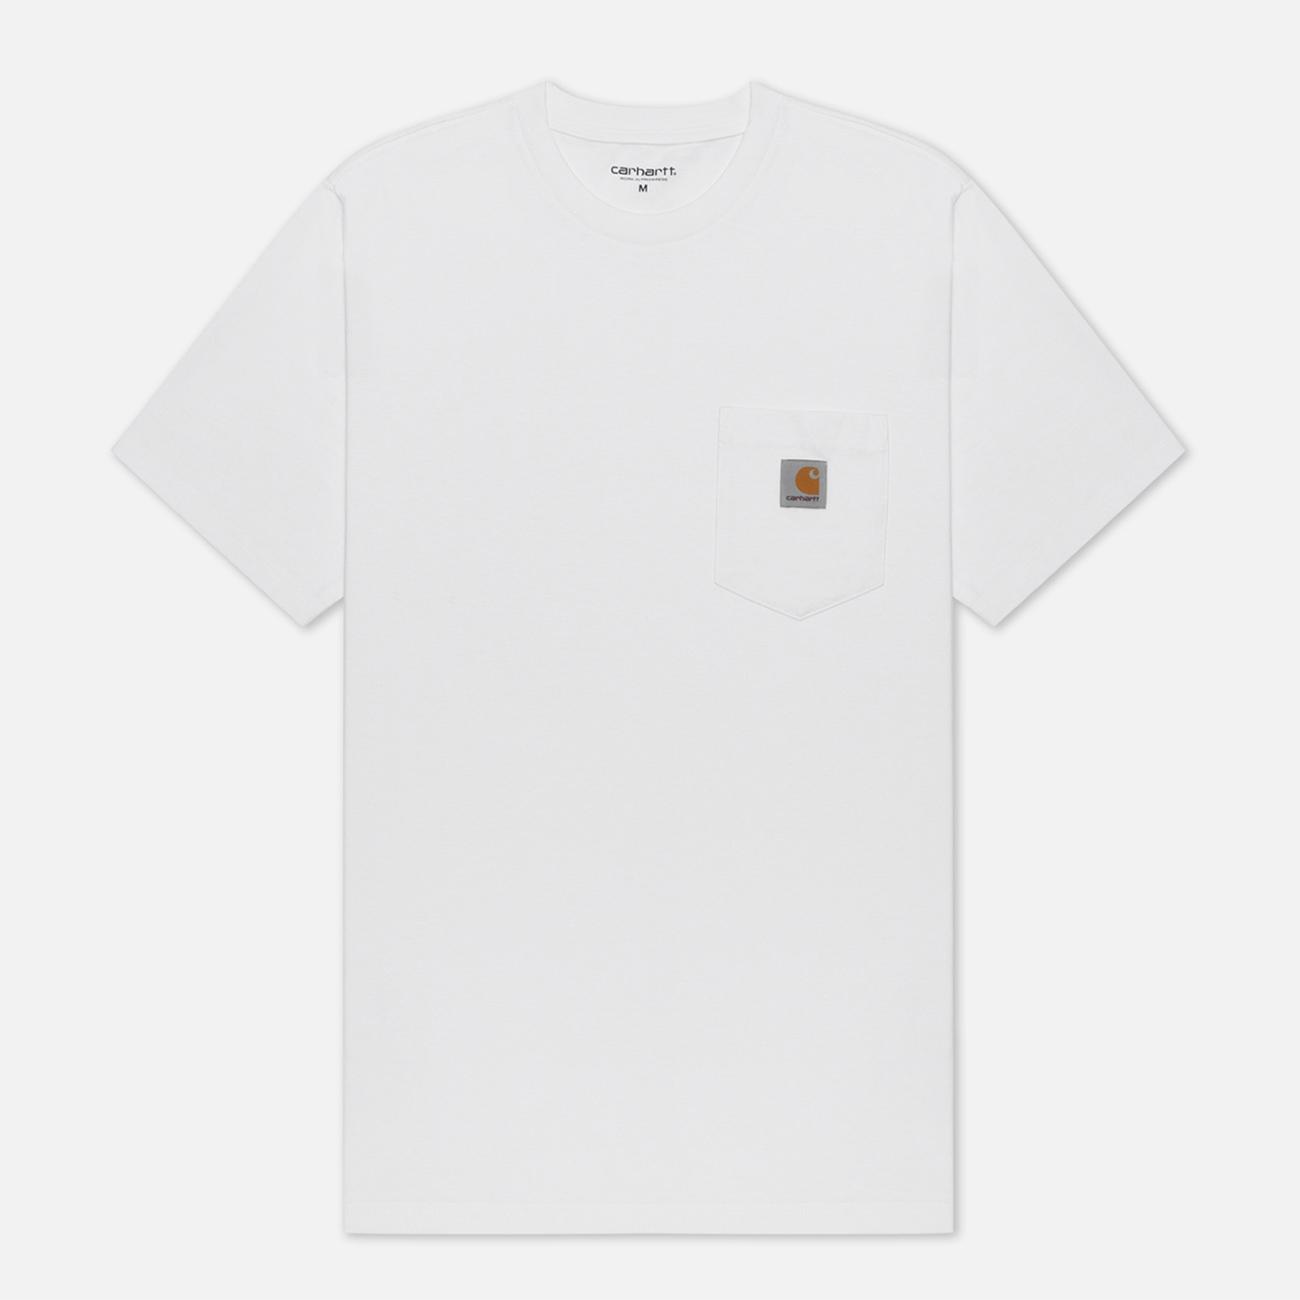 Мужская футболка Carhartt WIP S/S Pocket White